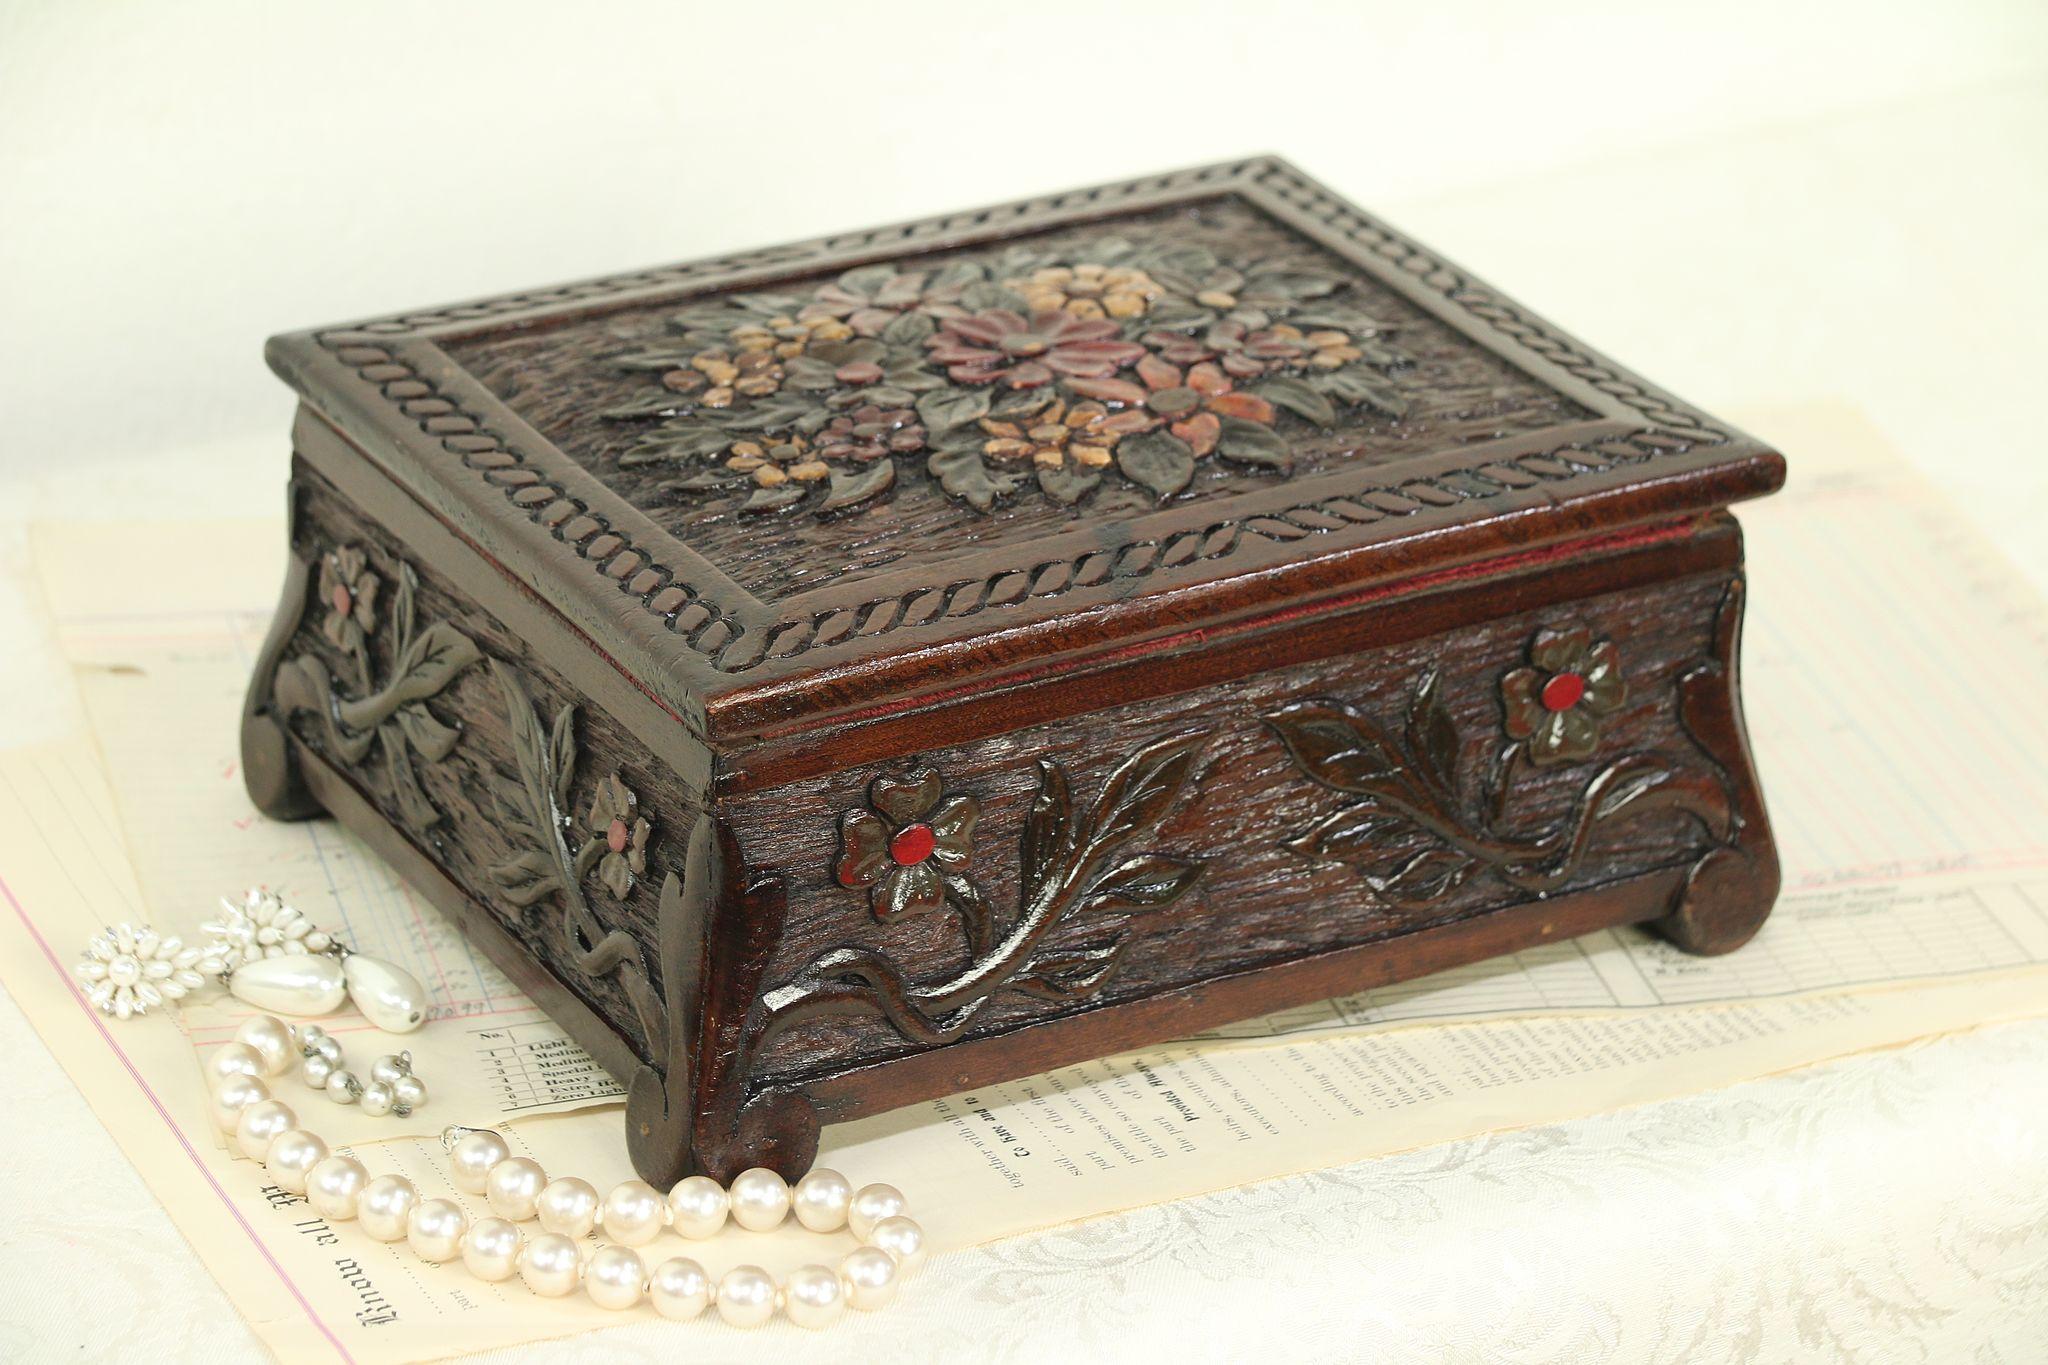 old hand painted metal box Small vintage jewelry box vintage jewelry holder old metal box vintage metal box